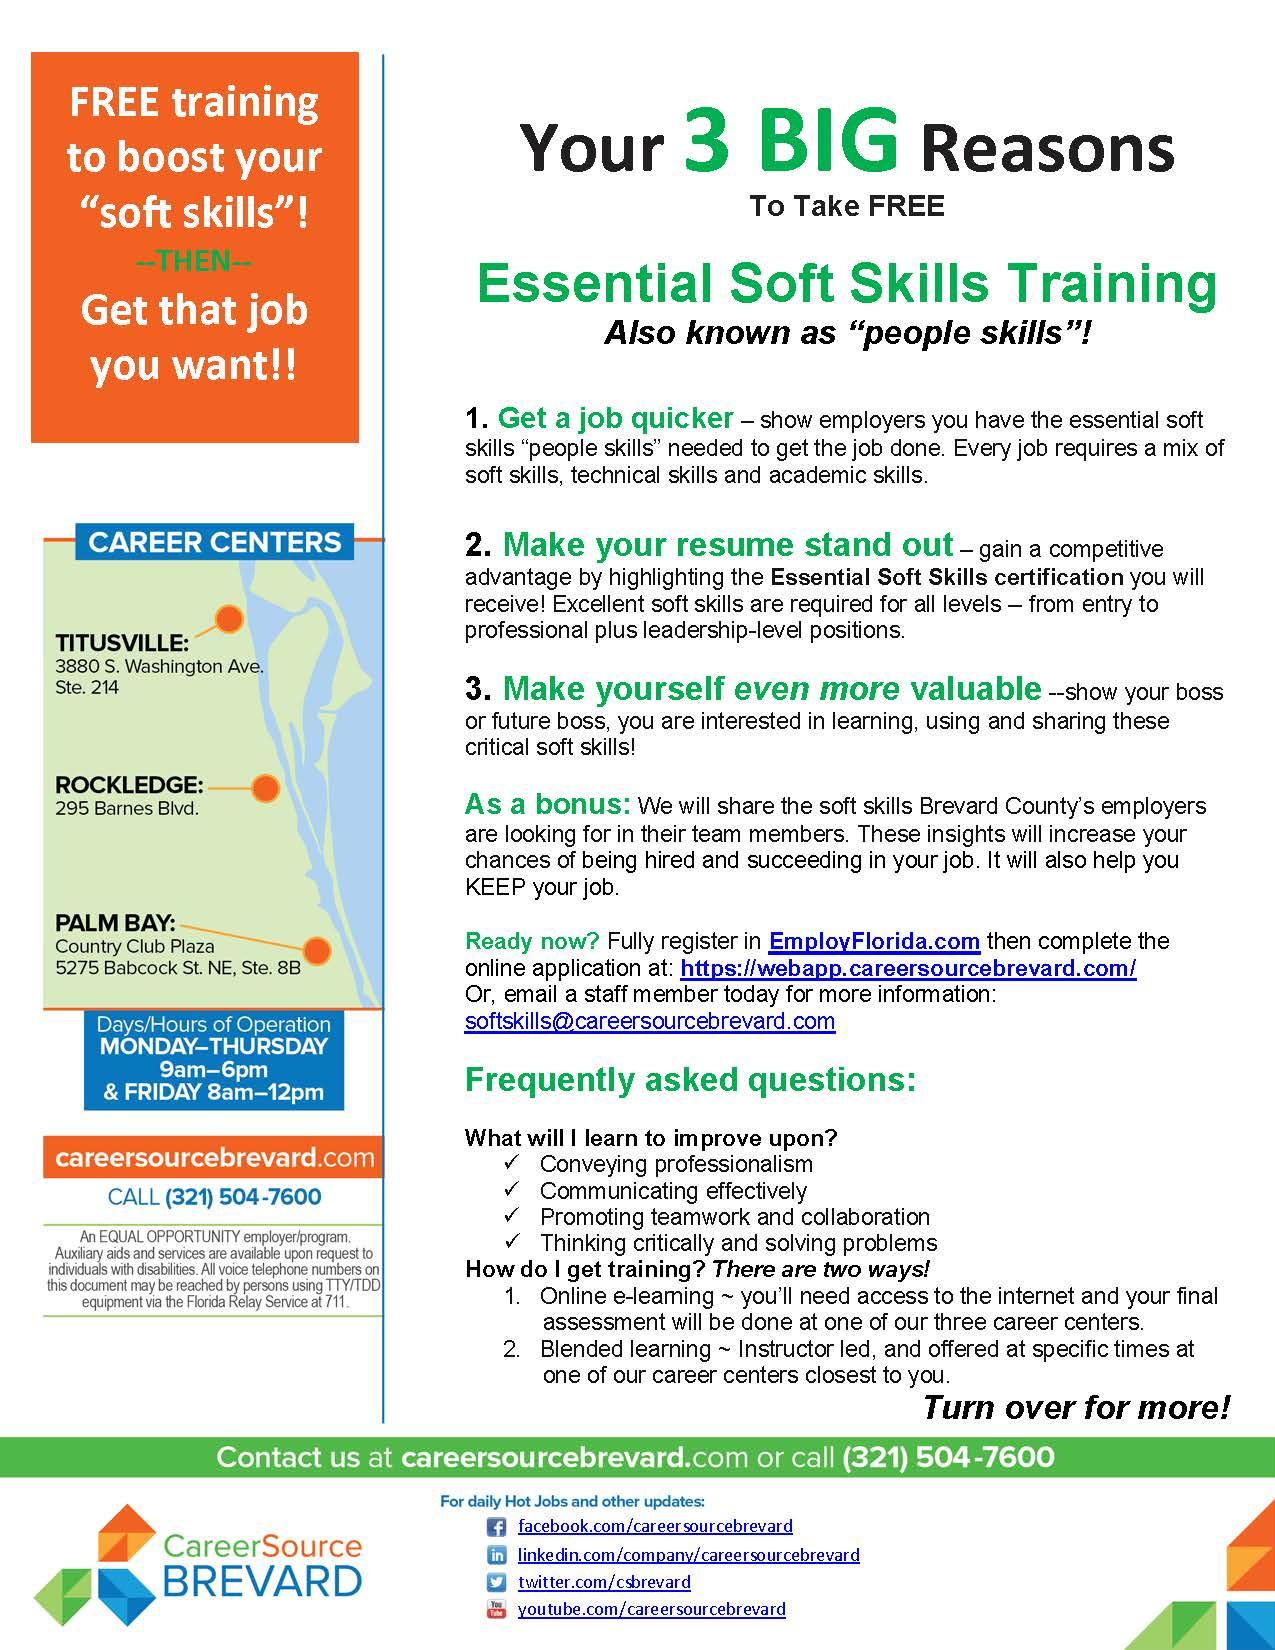 Essential Soft Skills Training